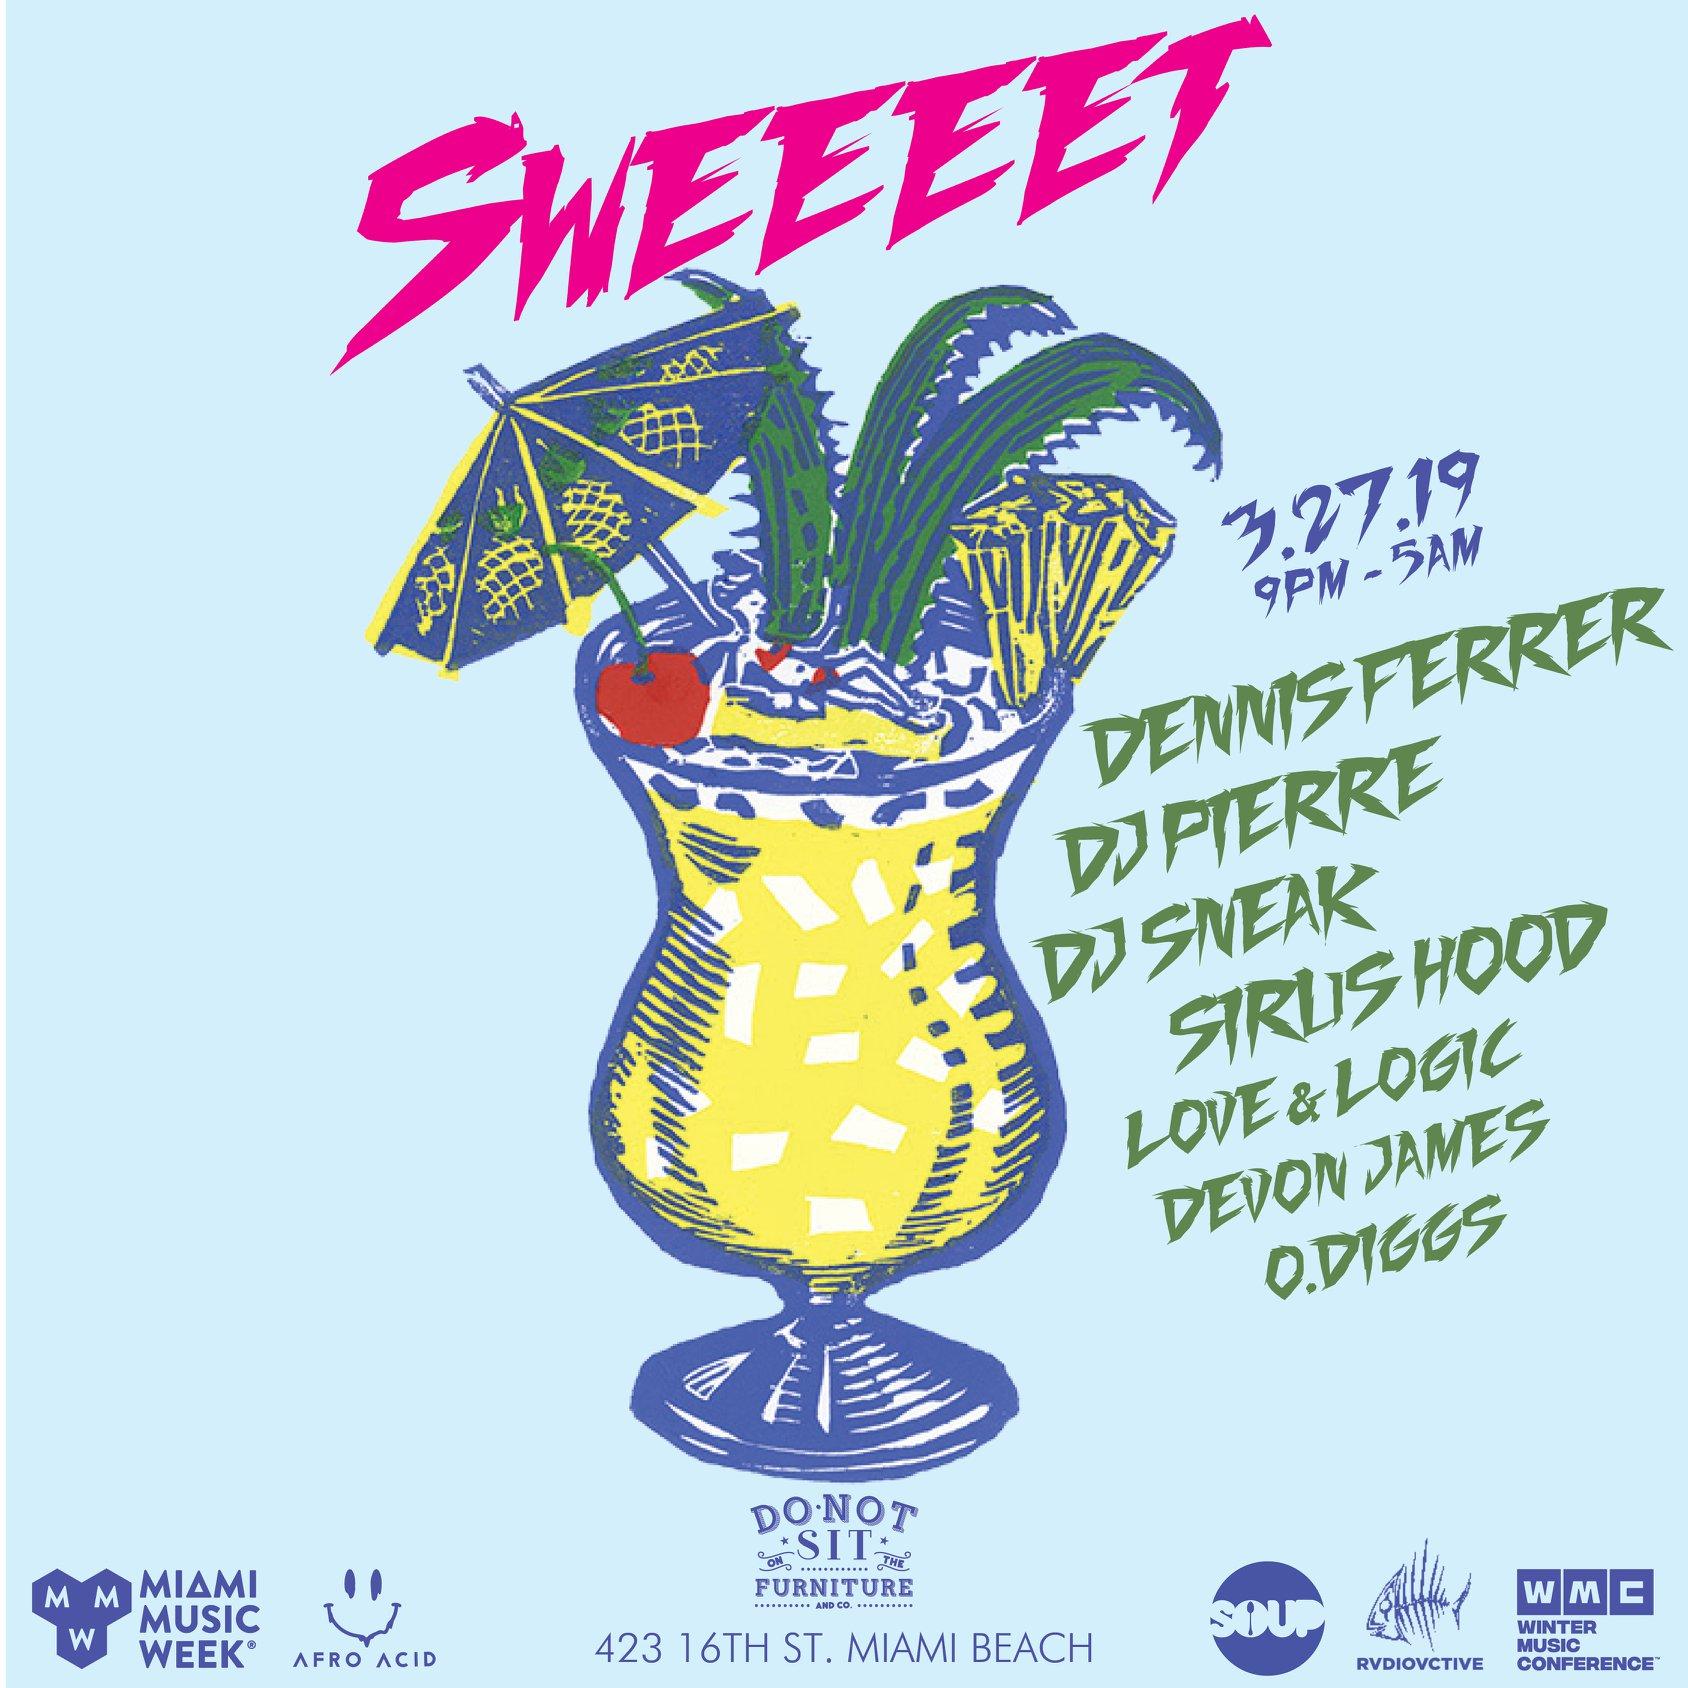 Sweeeet Miami Music Week 2019 - Lineup Flyer